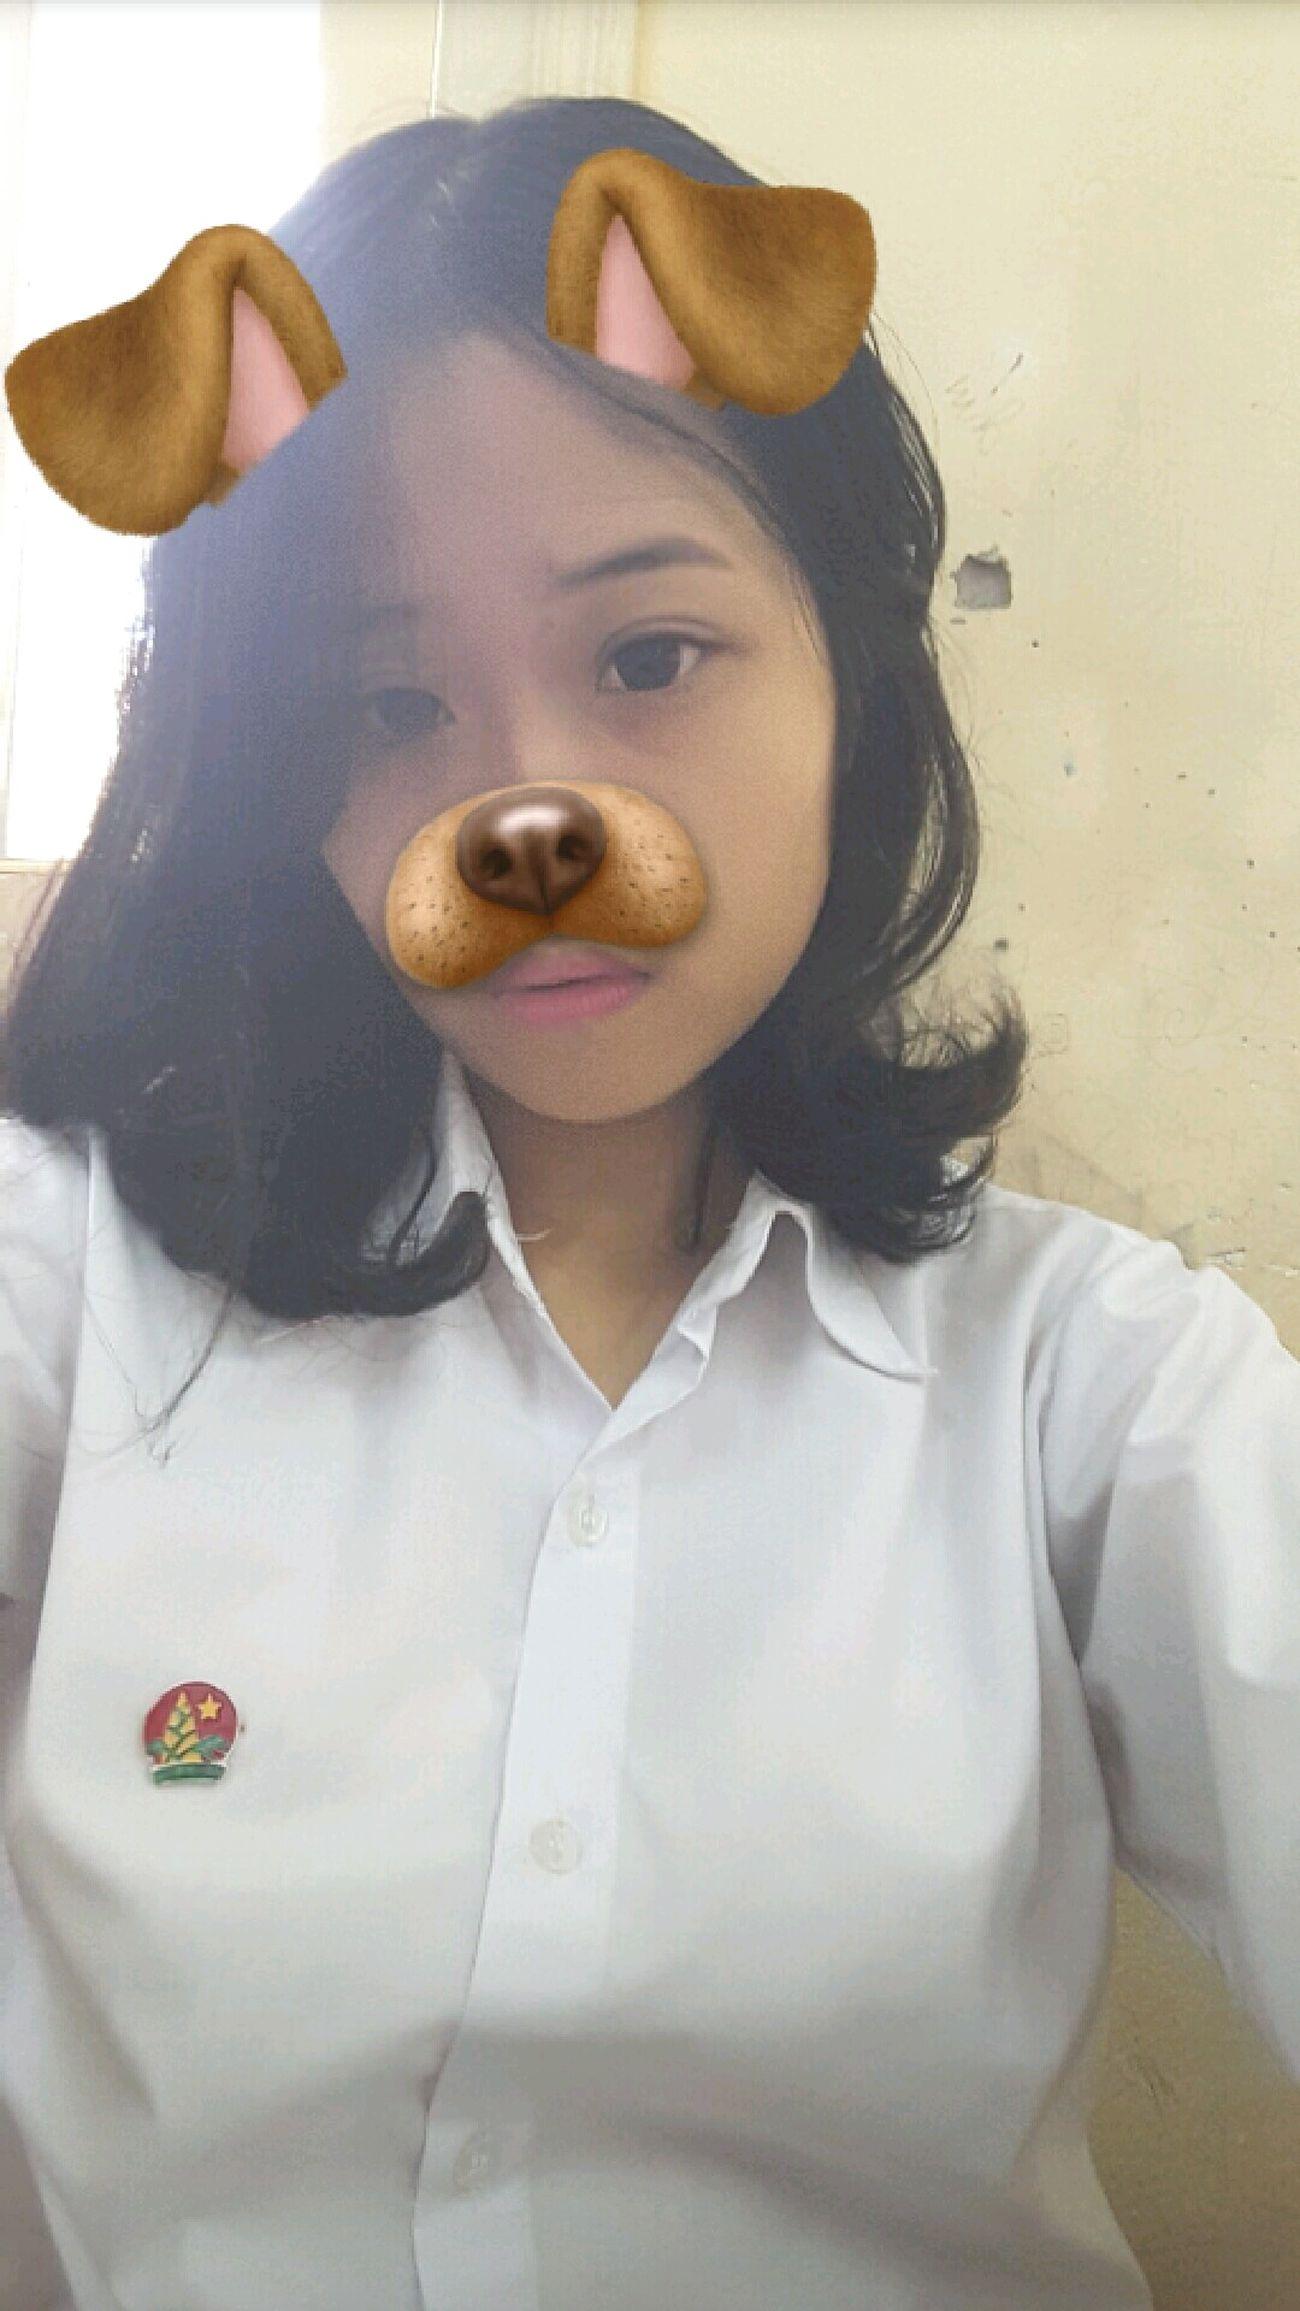 Vietnamesegirl Tired Follow4follow Sucker For Pain Fucklove Strees Get High Canabis Born To Die